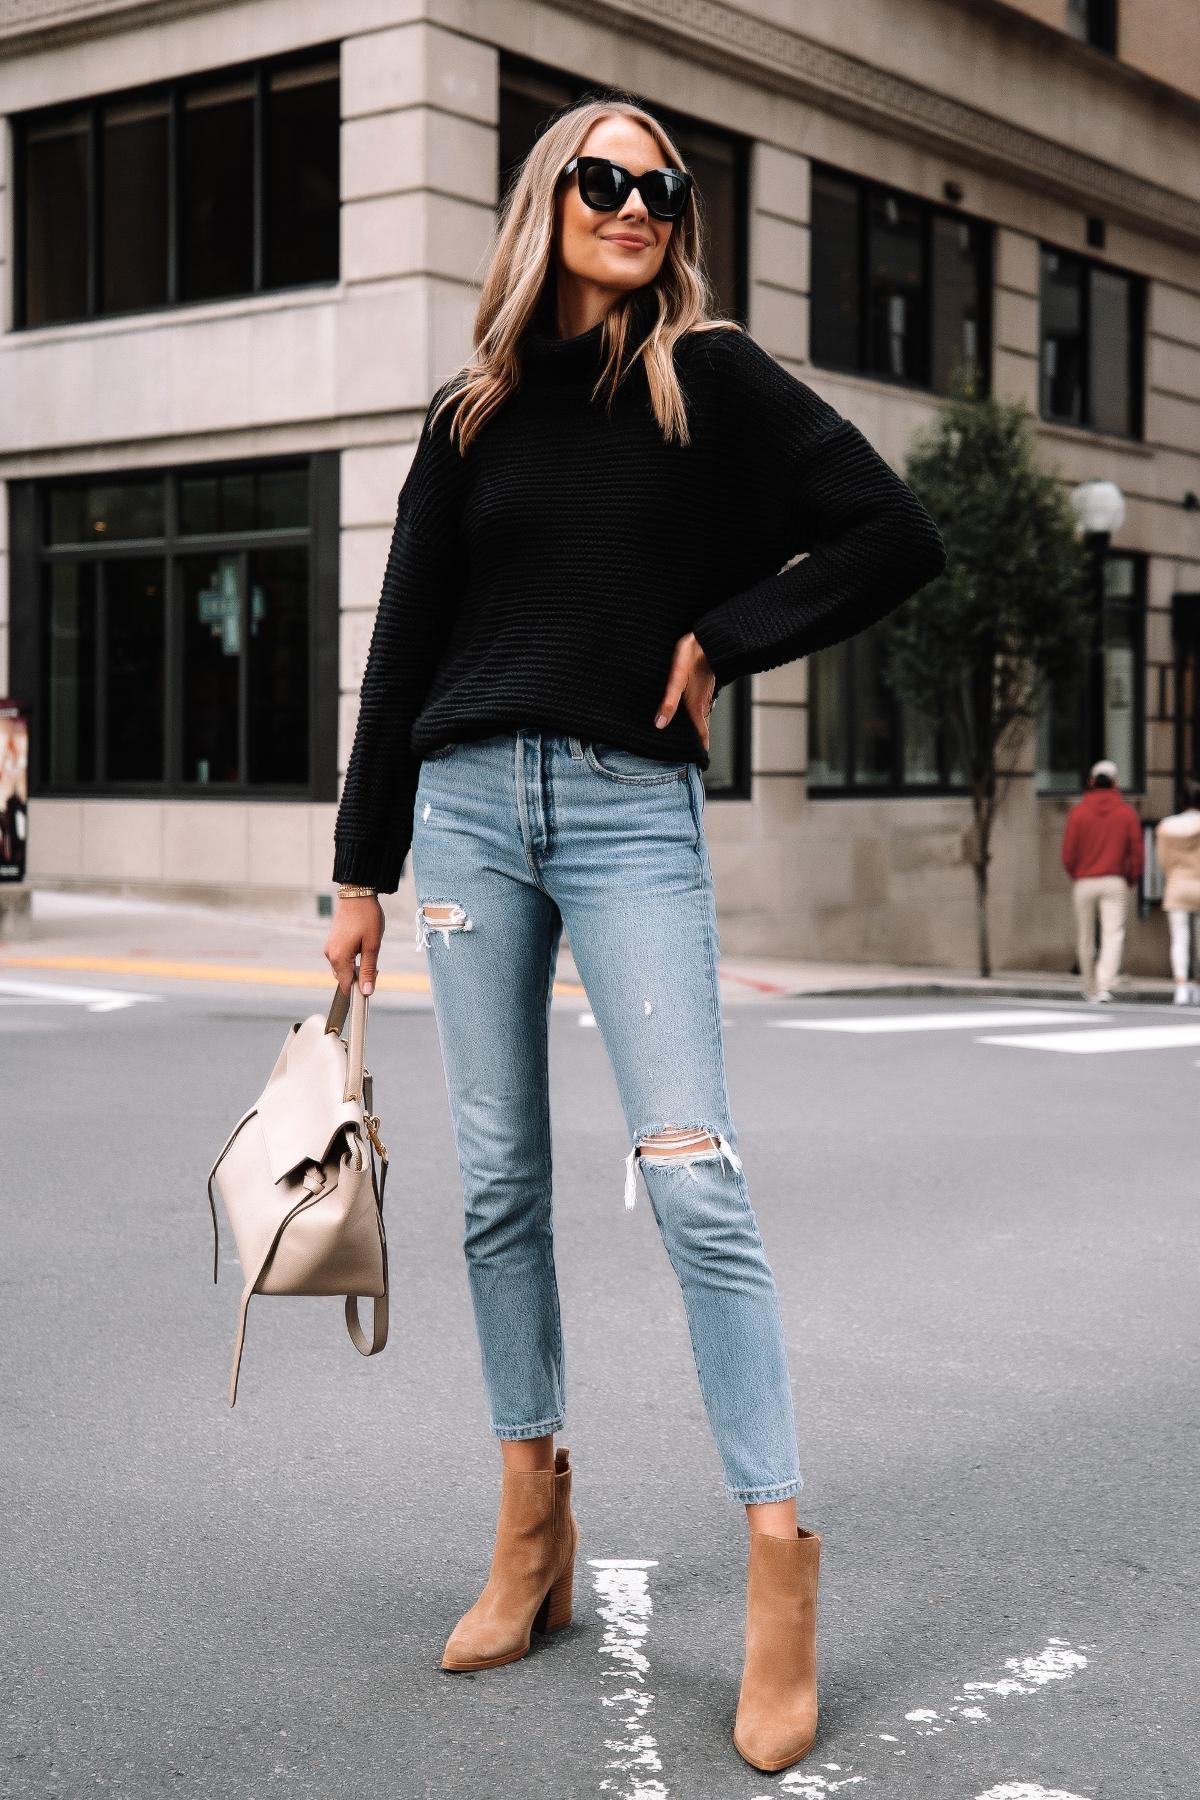 Fashion Jackson Wearing Amazon Fashion Black Turtleneck Sweater Levis Ripped Jeans Tan Suede Booties 3